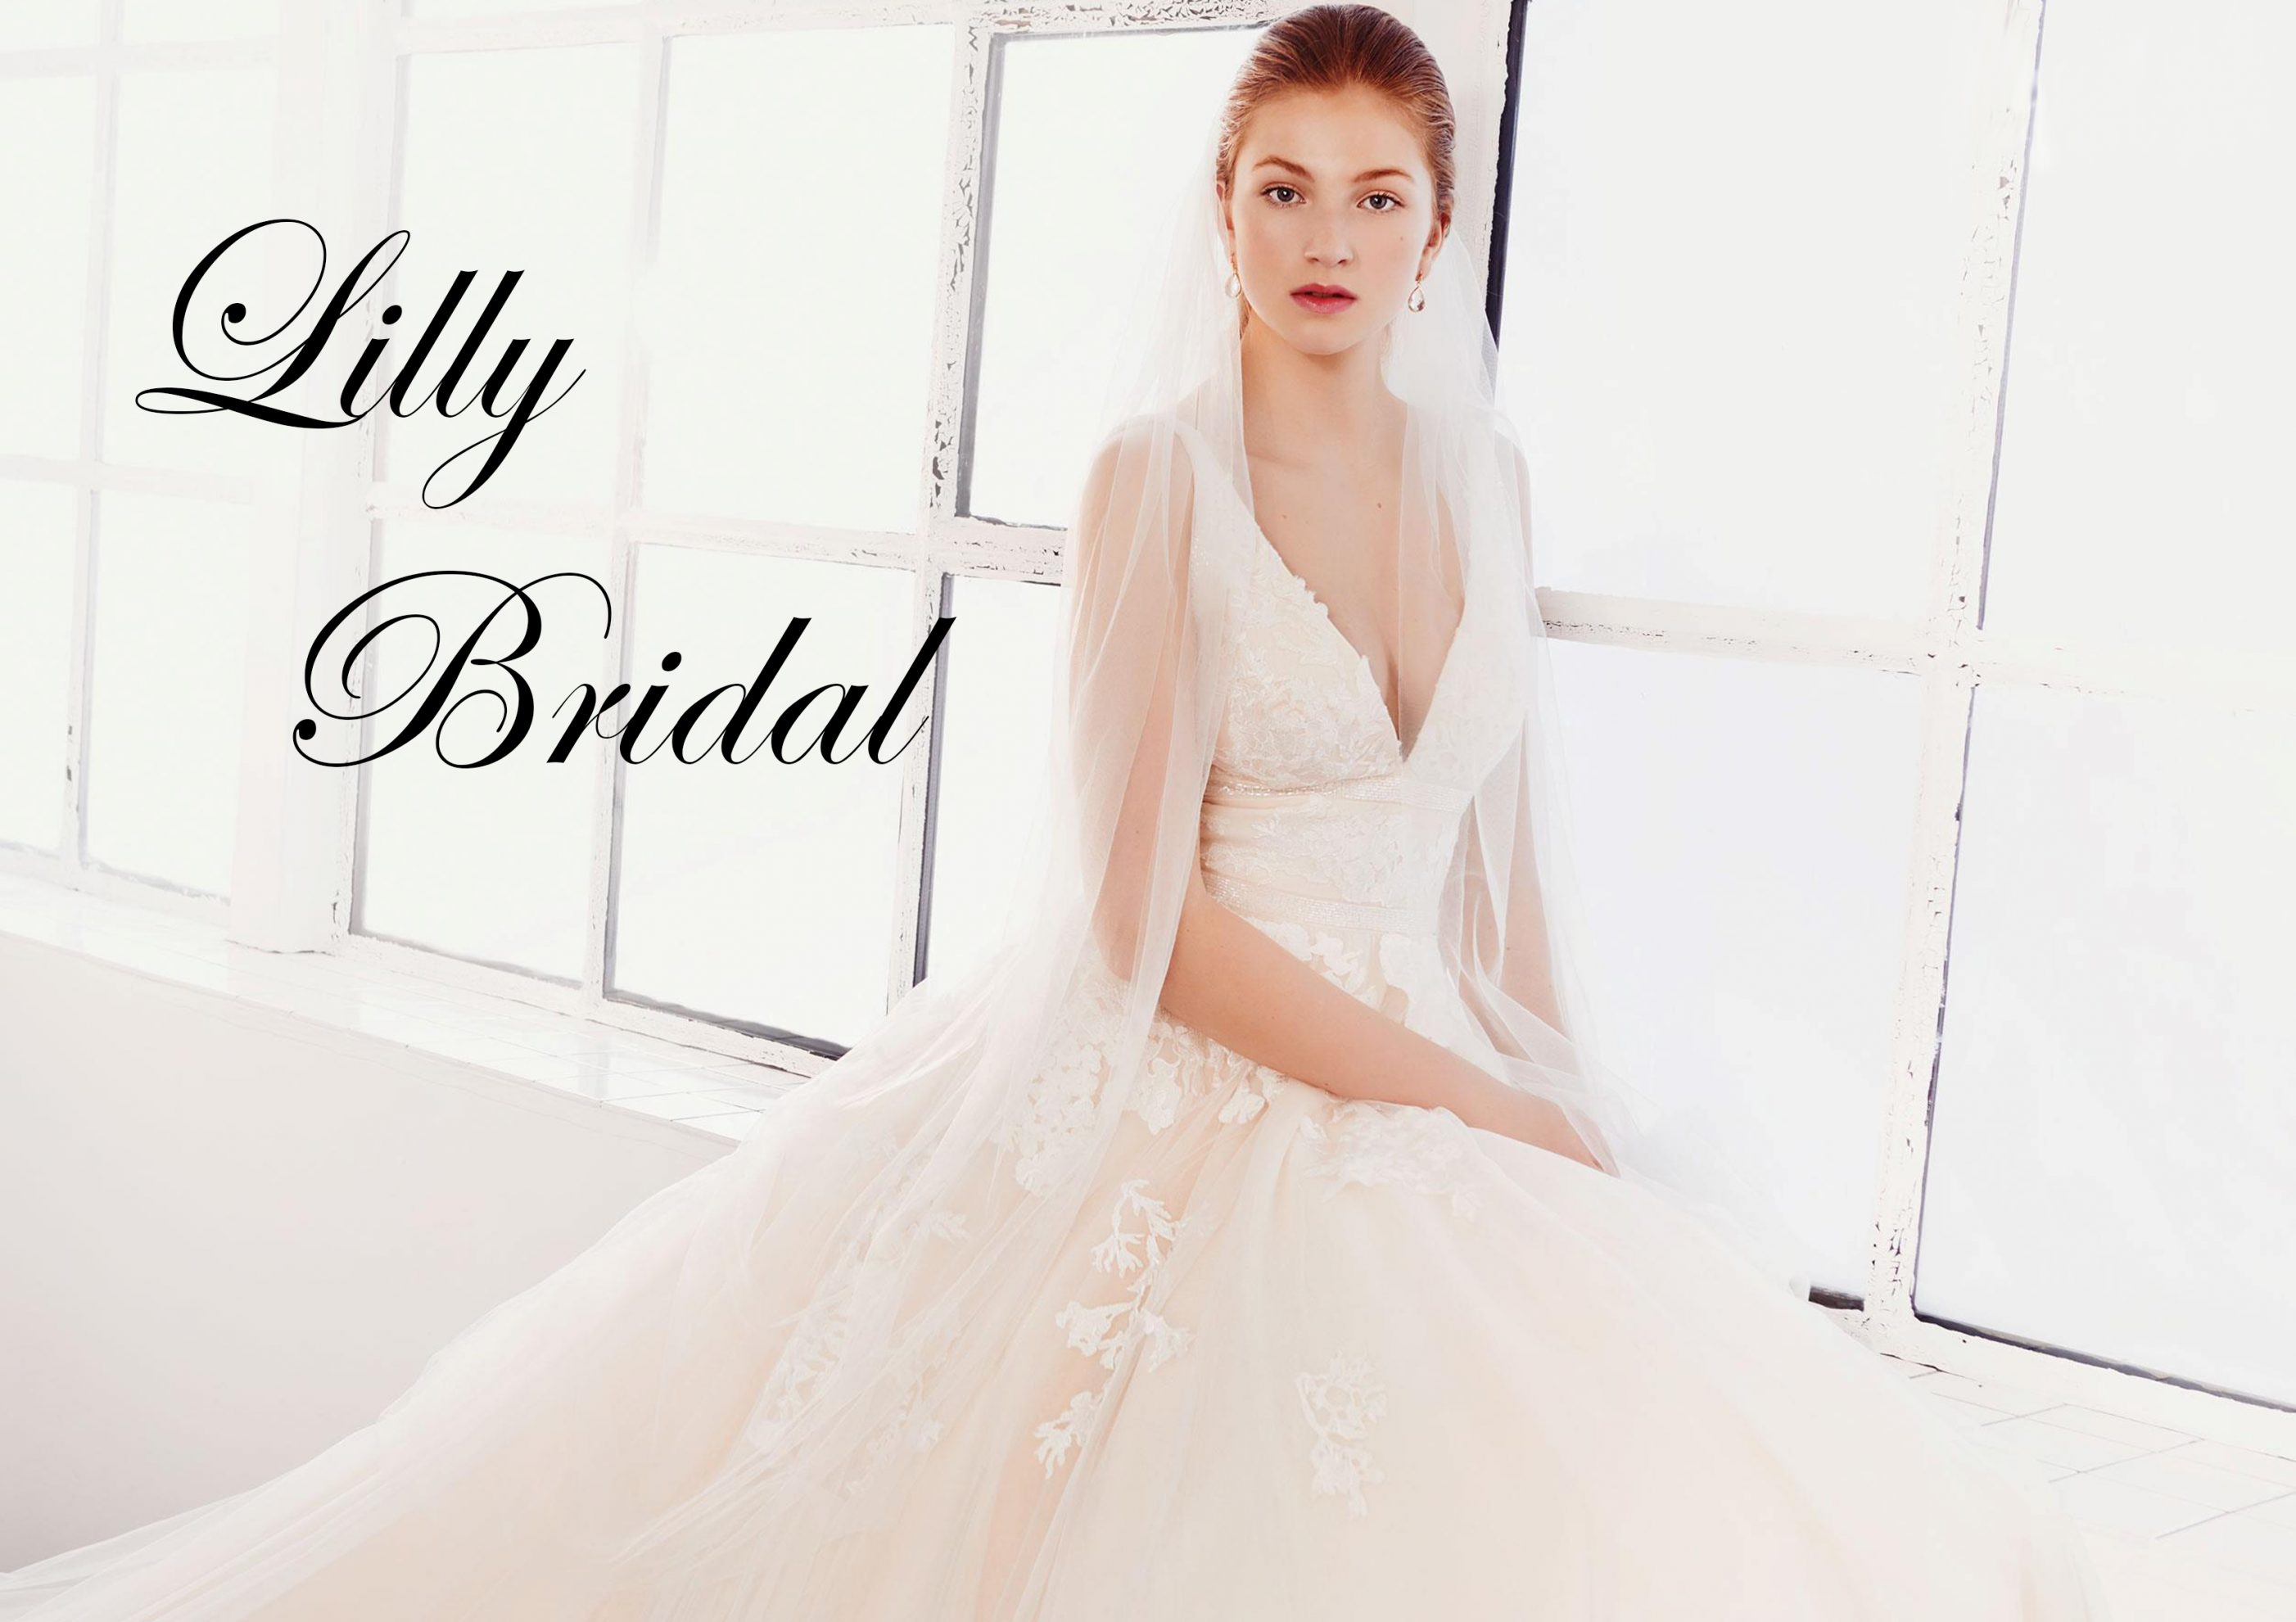 Afb Lilly Bridal logo e